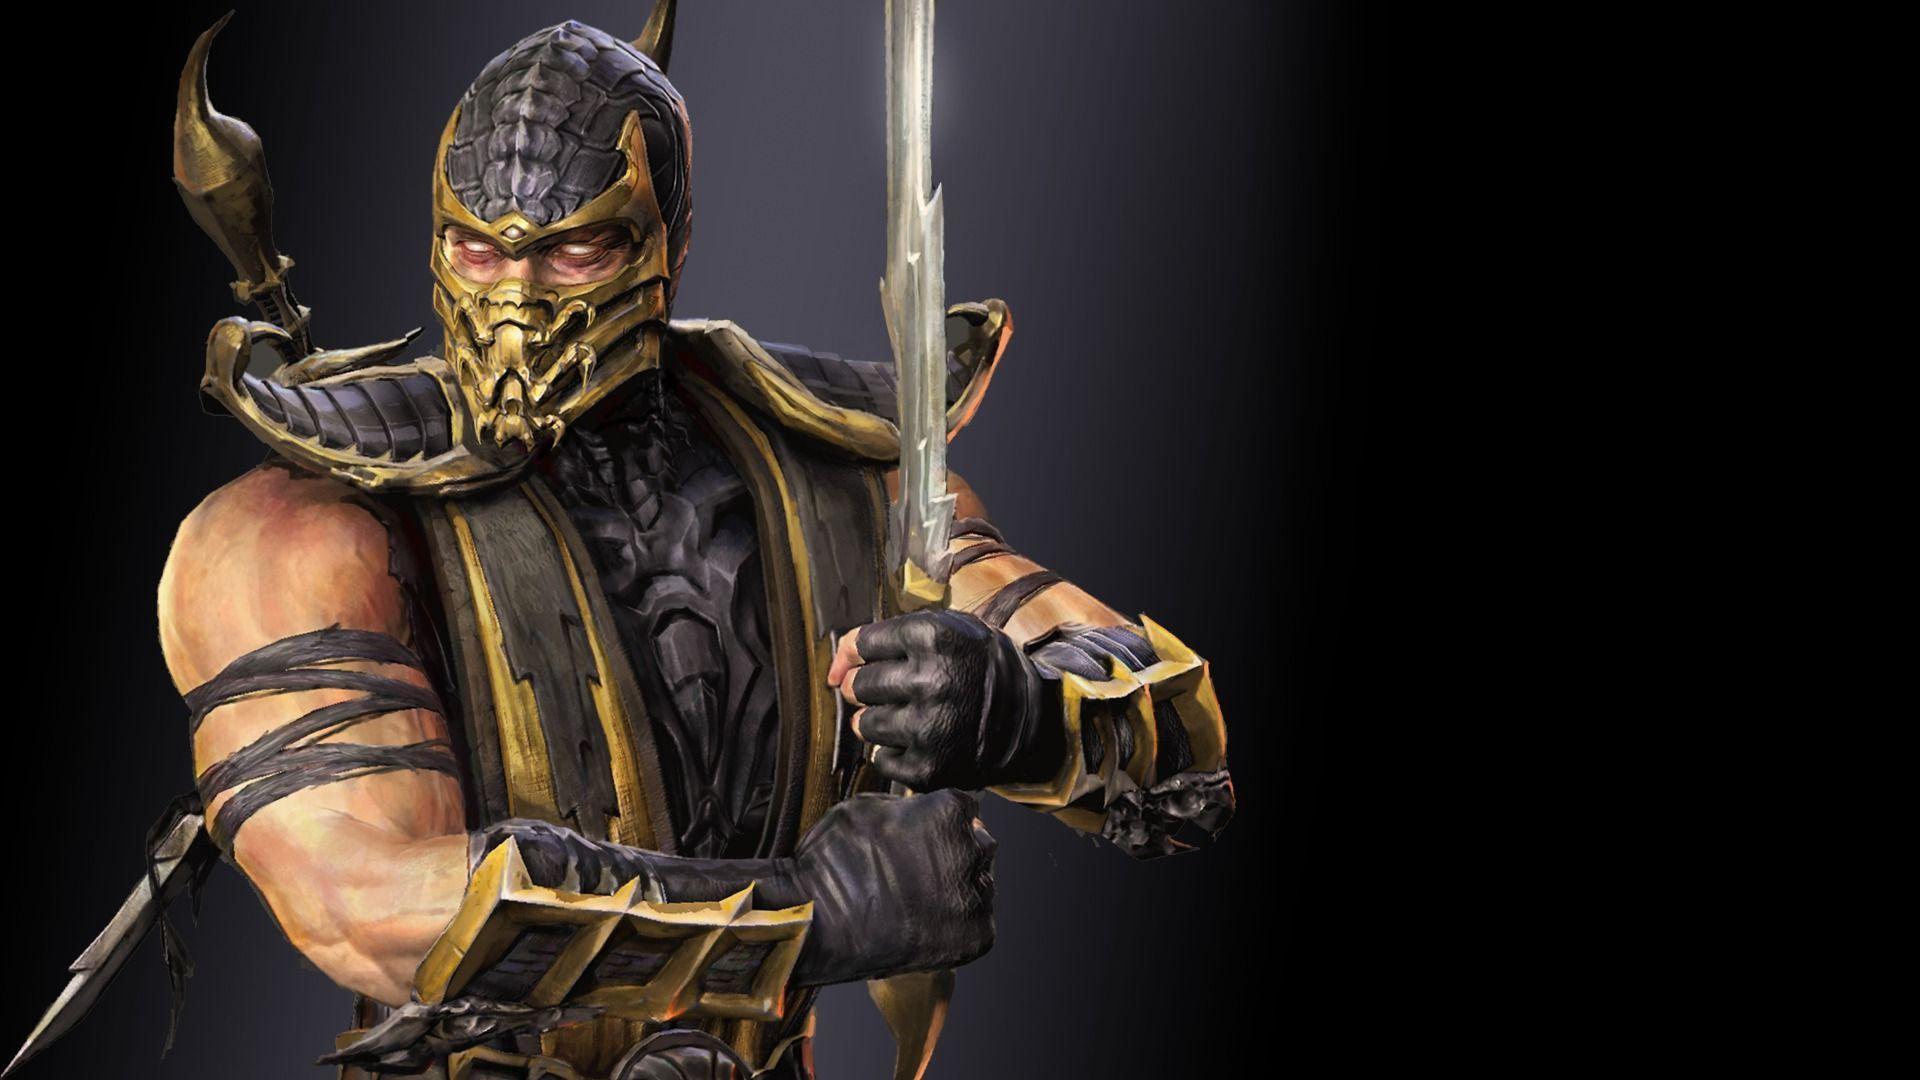 Scorpion   Mortal Kombat wallpaper 1920x1080